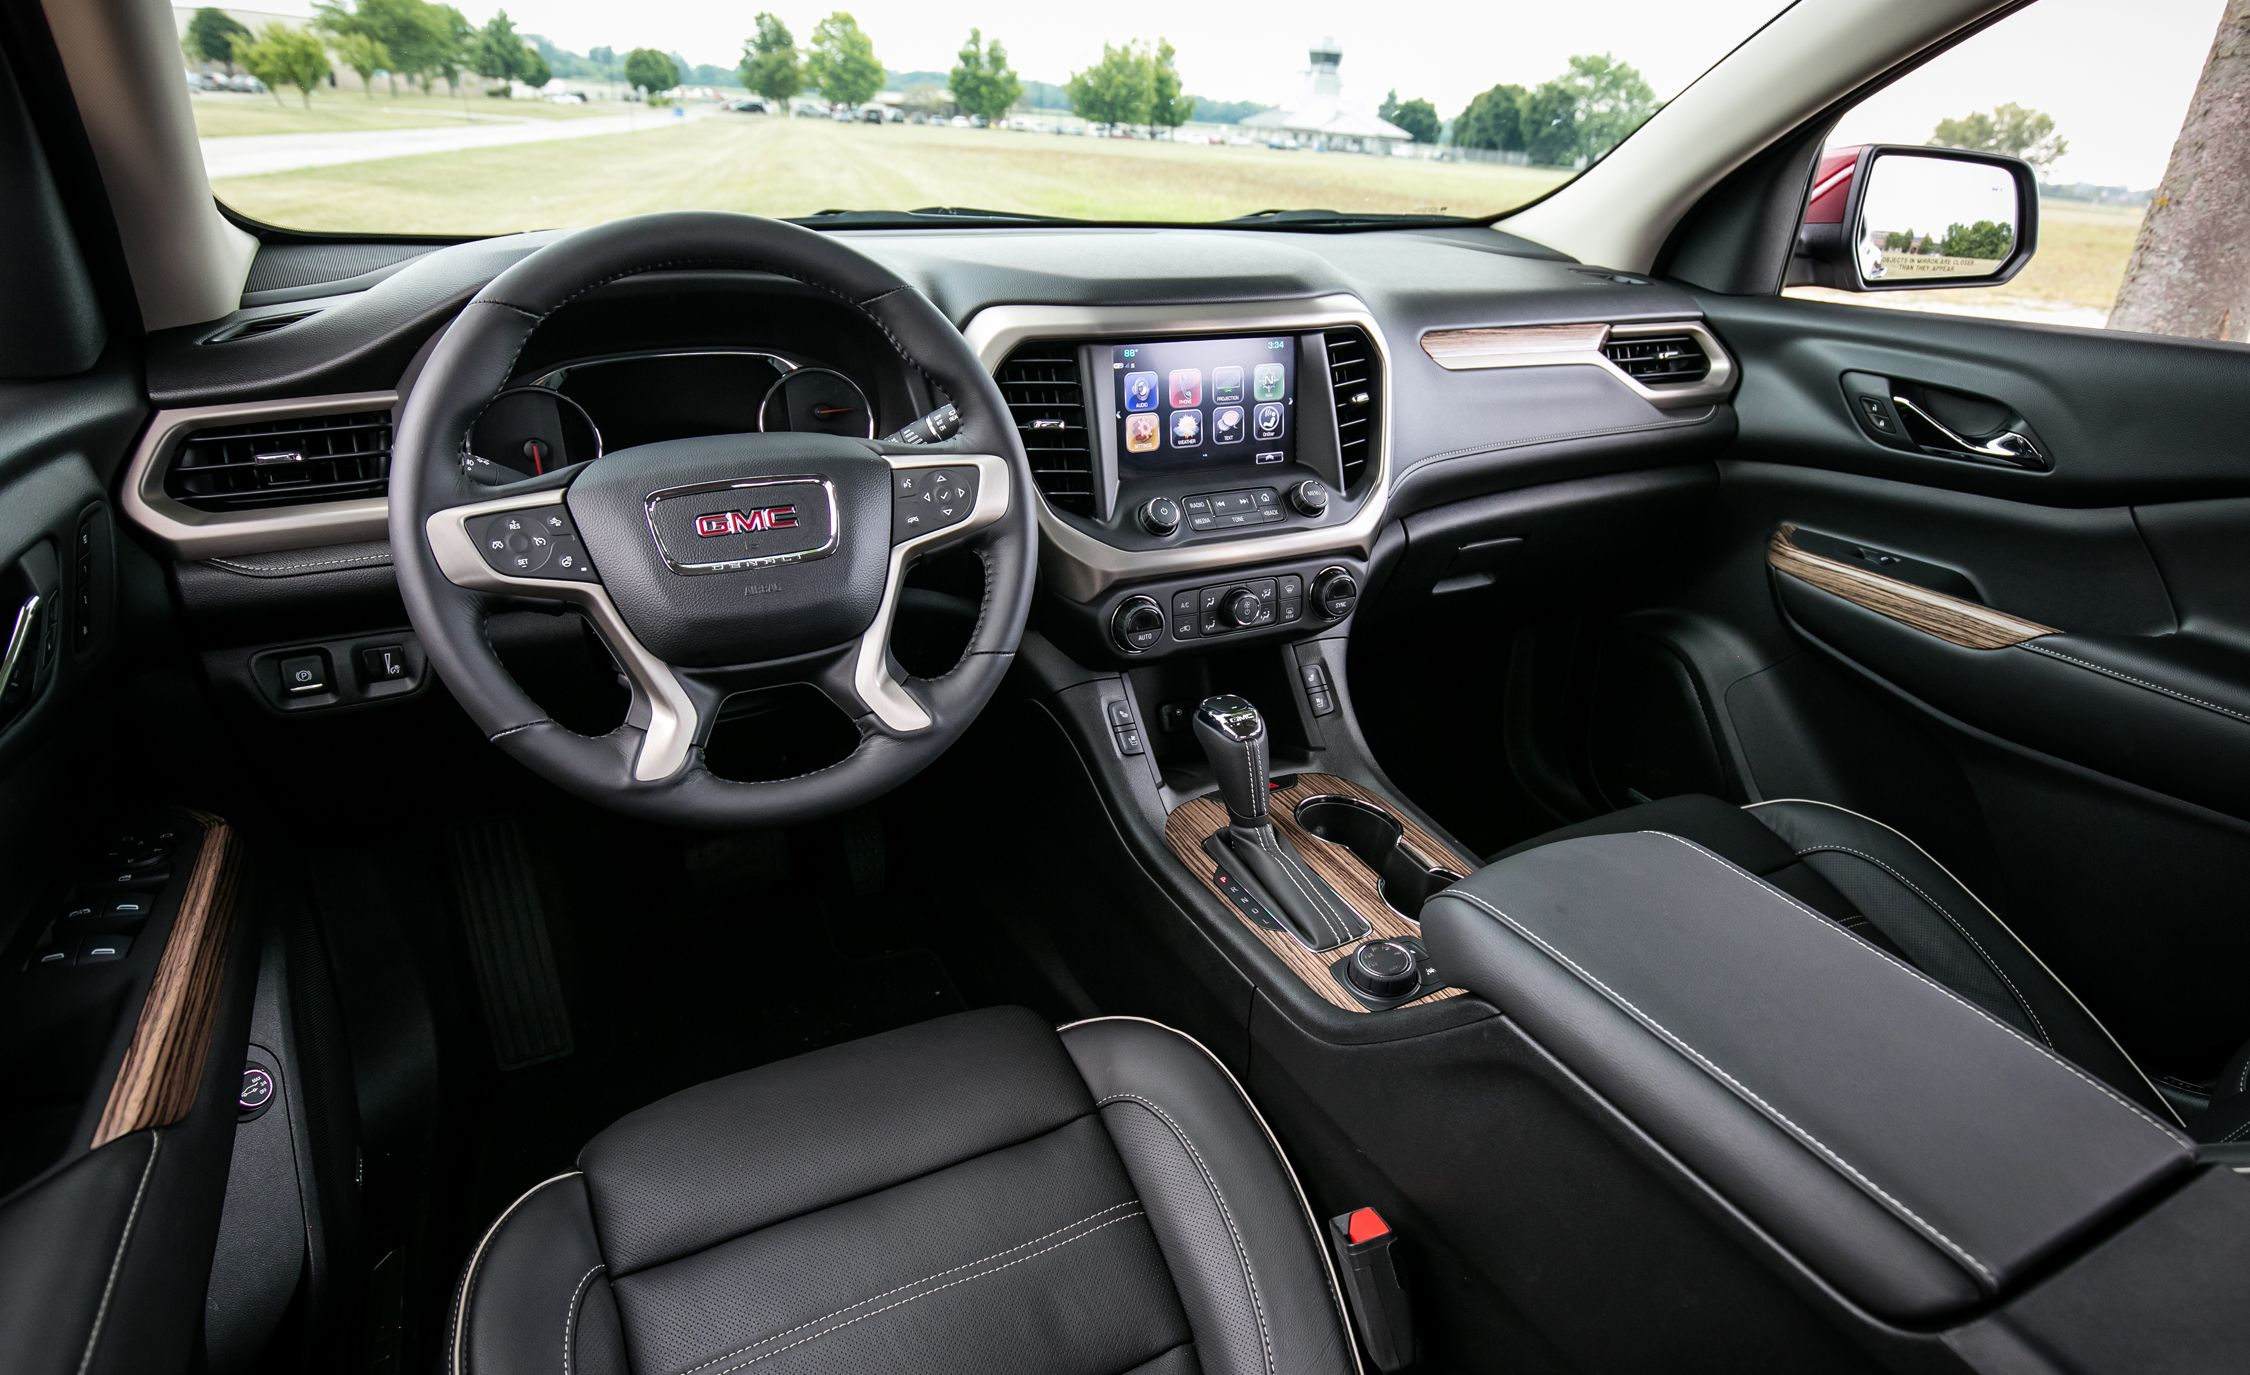 2017 GMC Acadia | Interior Review | Car and Driver